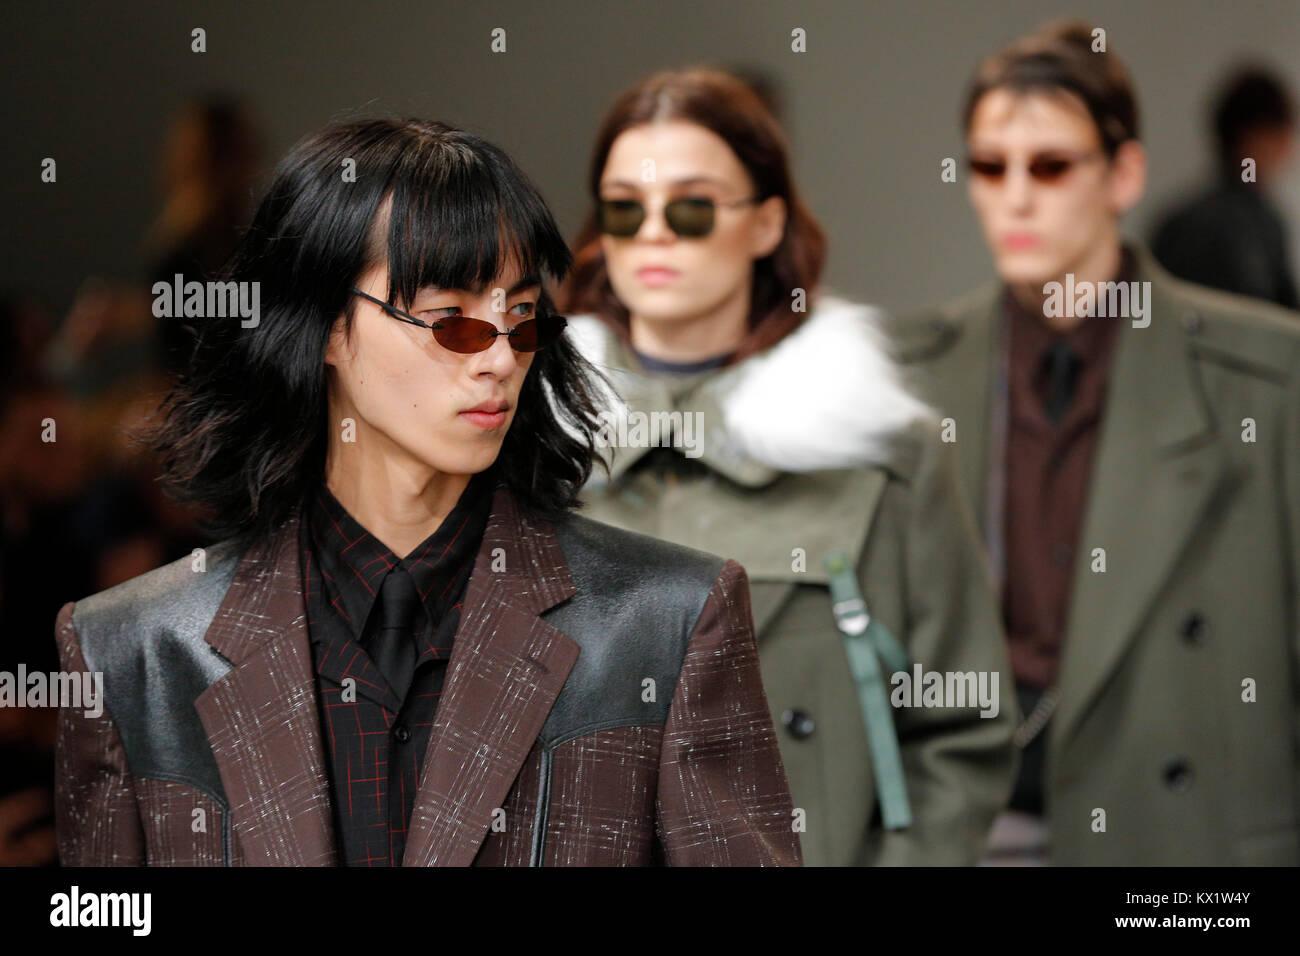 Londres, Royaume-Uni. 06 Jan, 2018. 6 janvier 2018 John Lawrence Sullivan catwalk au London Fashion Week AW18 pour Photo Stock